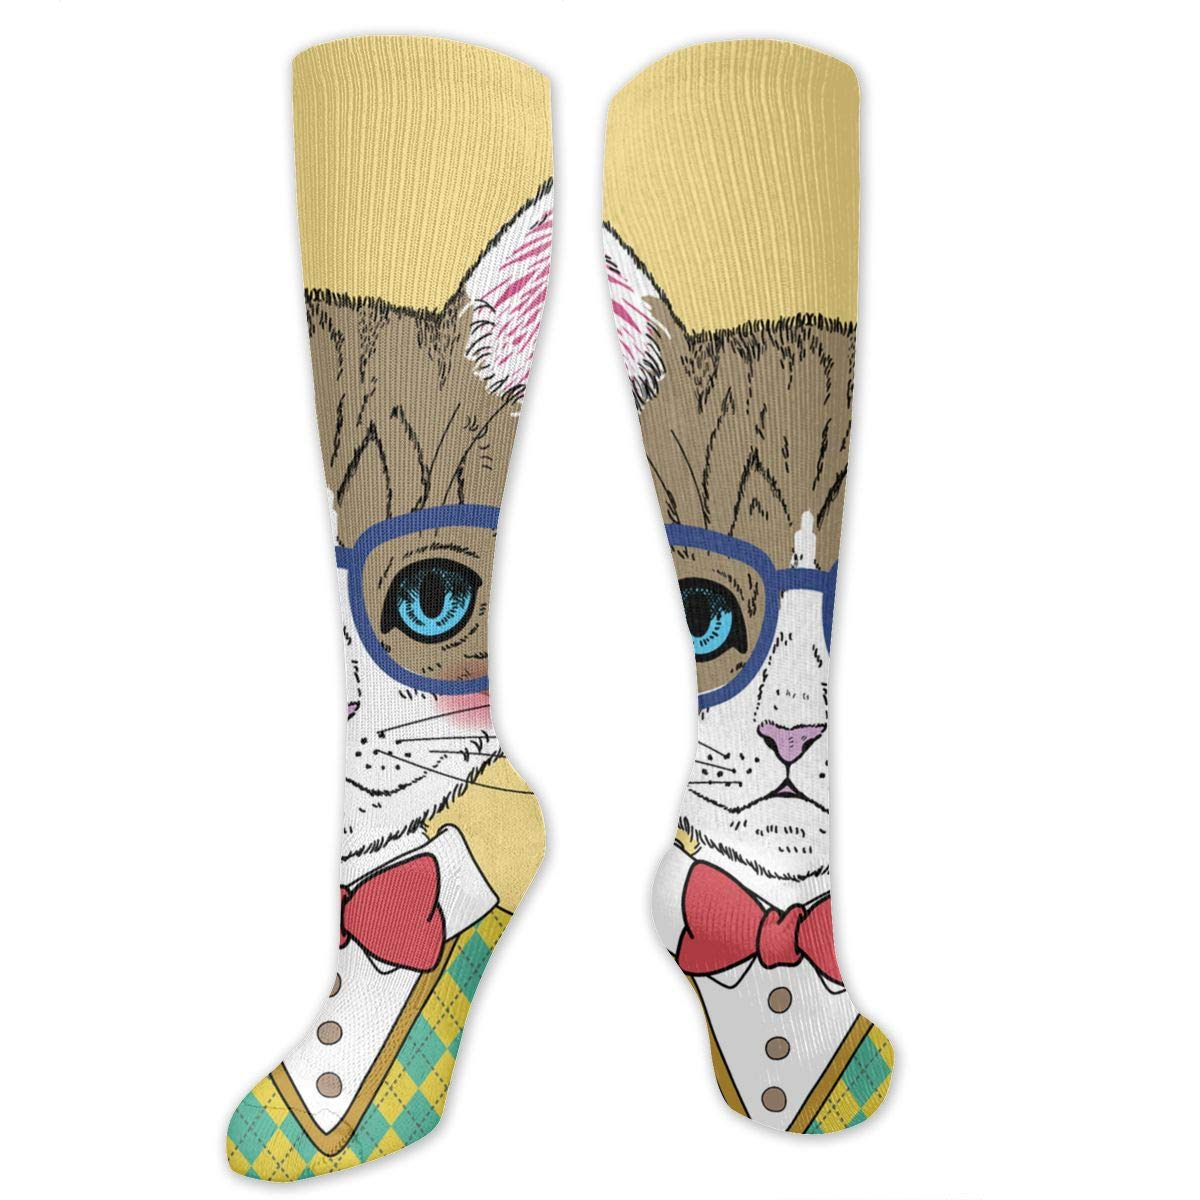 Chanwazibibiliu The Cat in The Plaid Sweater Mens Colorful Dress Socks Funky Men Multicolored Pattern Fashionable Fun Crew Cotton Socks